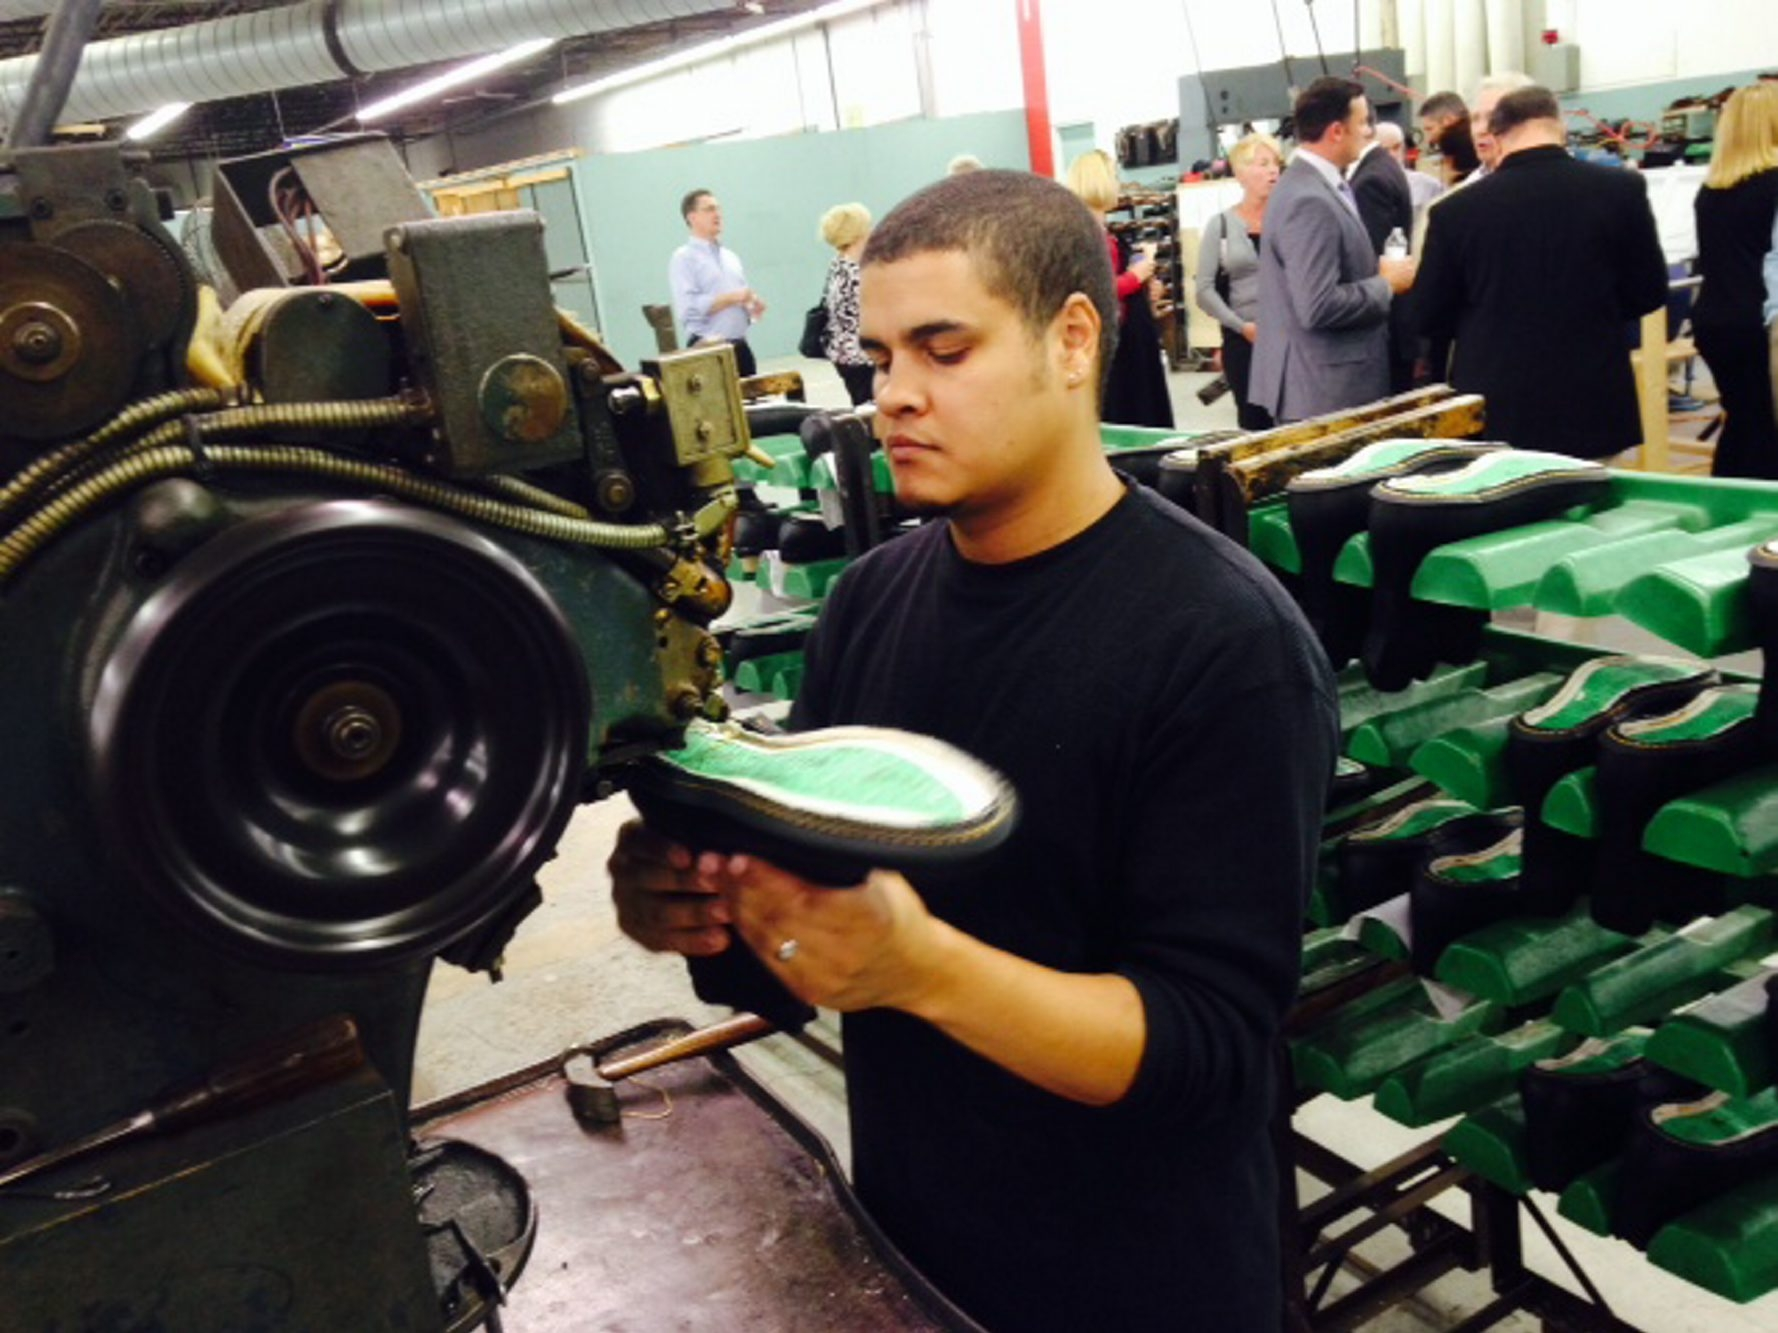 Jordan Brooks inseams a work boot at the PW Minor shoe company in Batavia. (Robert Kirkham/Buffalo News)